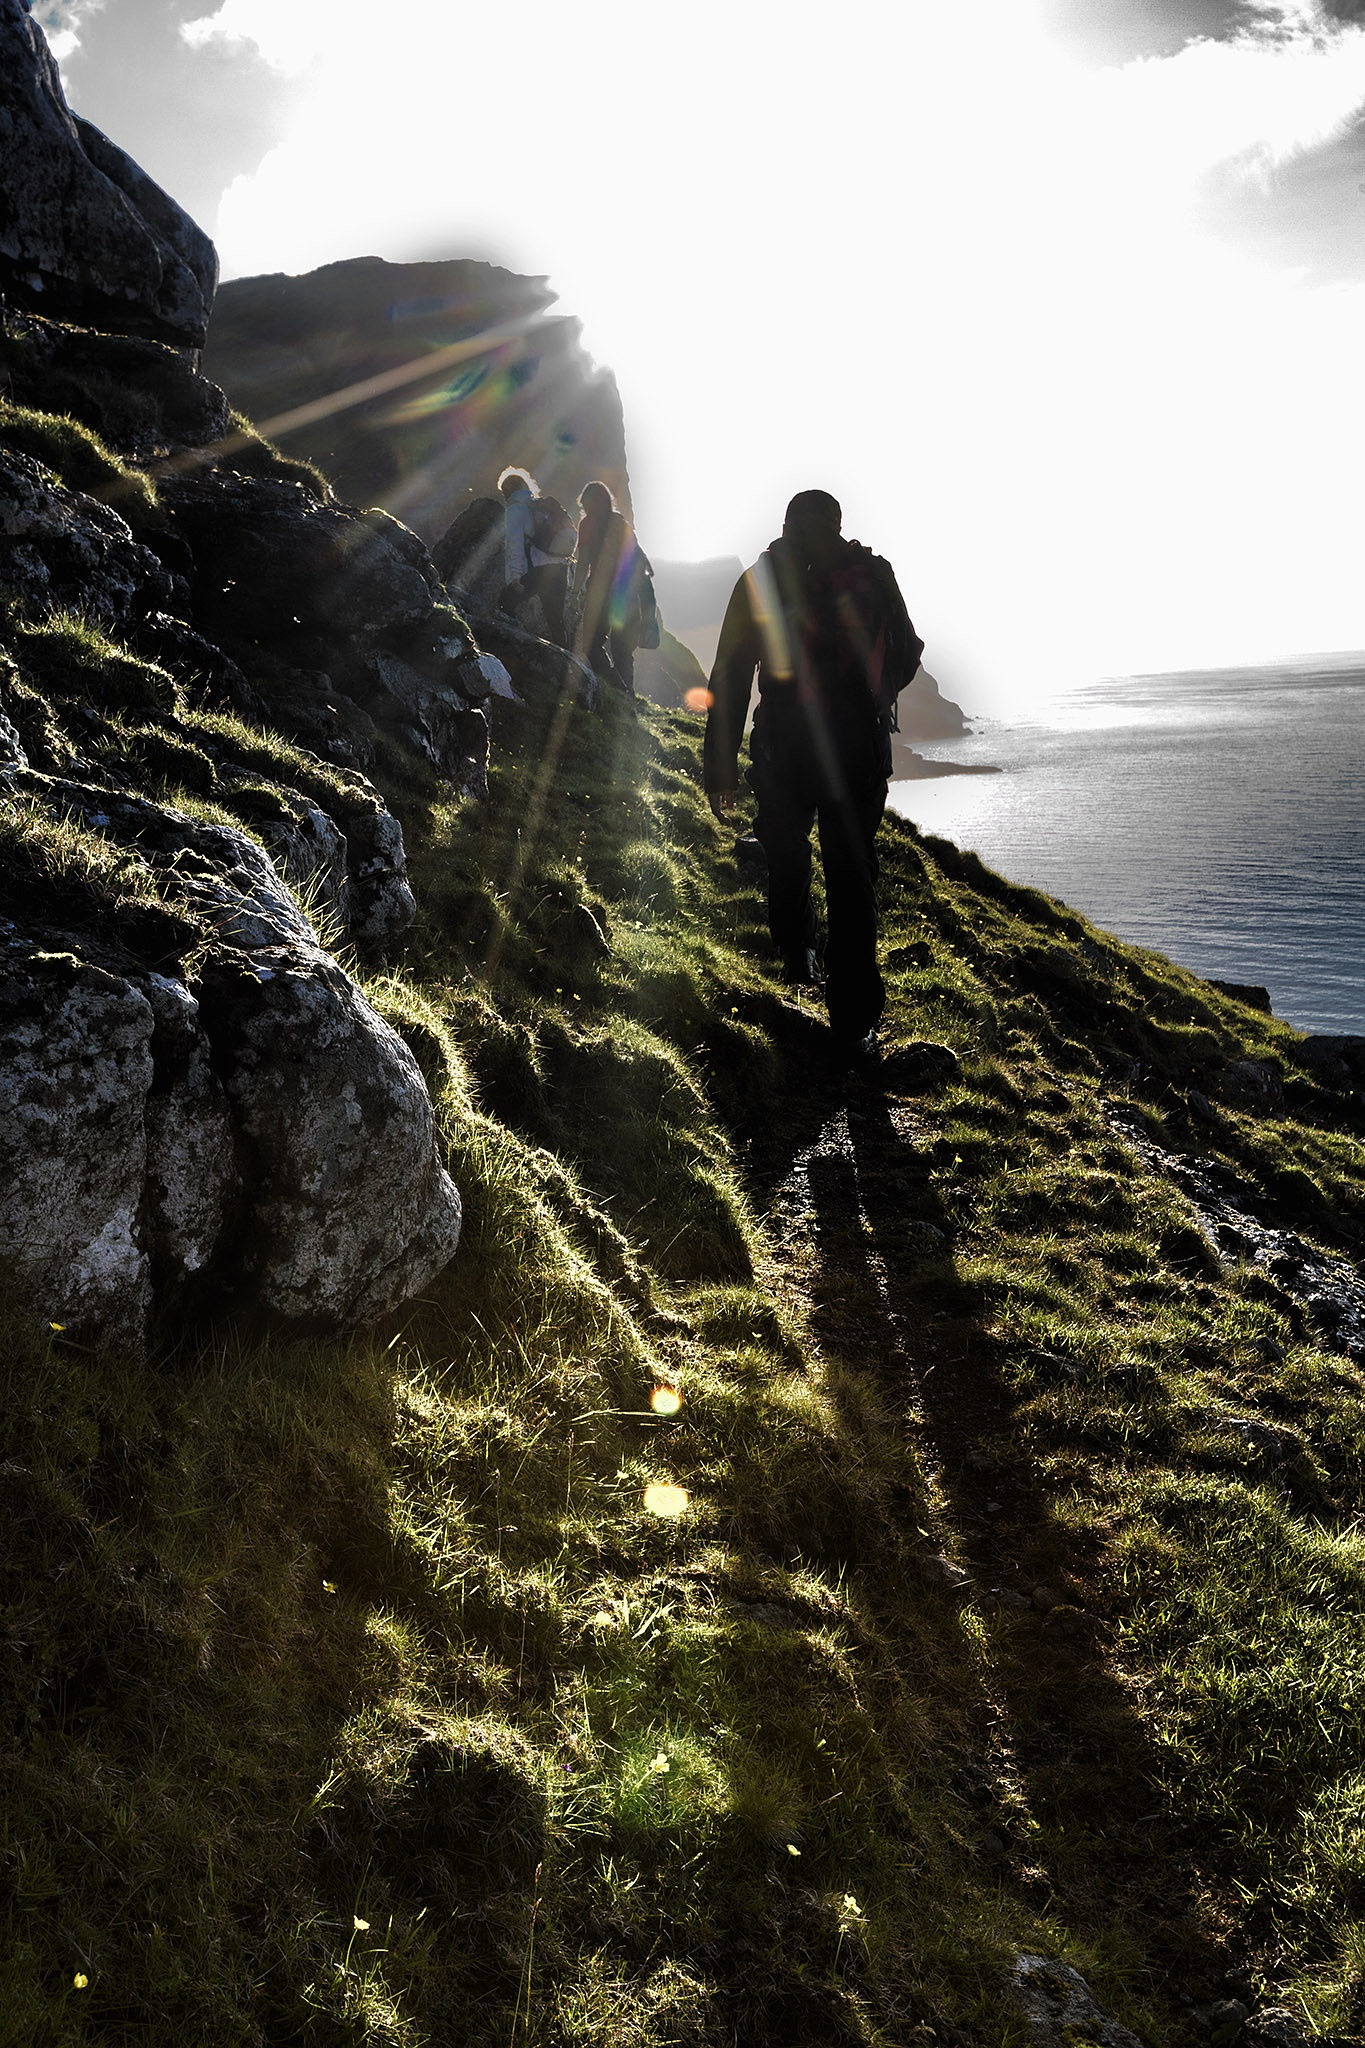 Afternoon hiking in the Faroe Islands by Faroe Islands Hiking